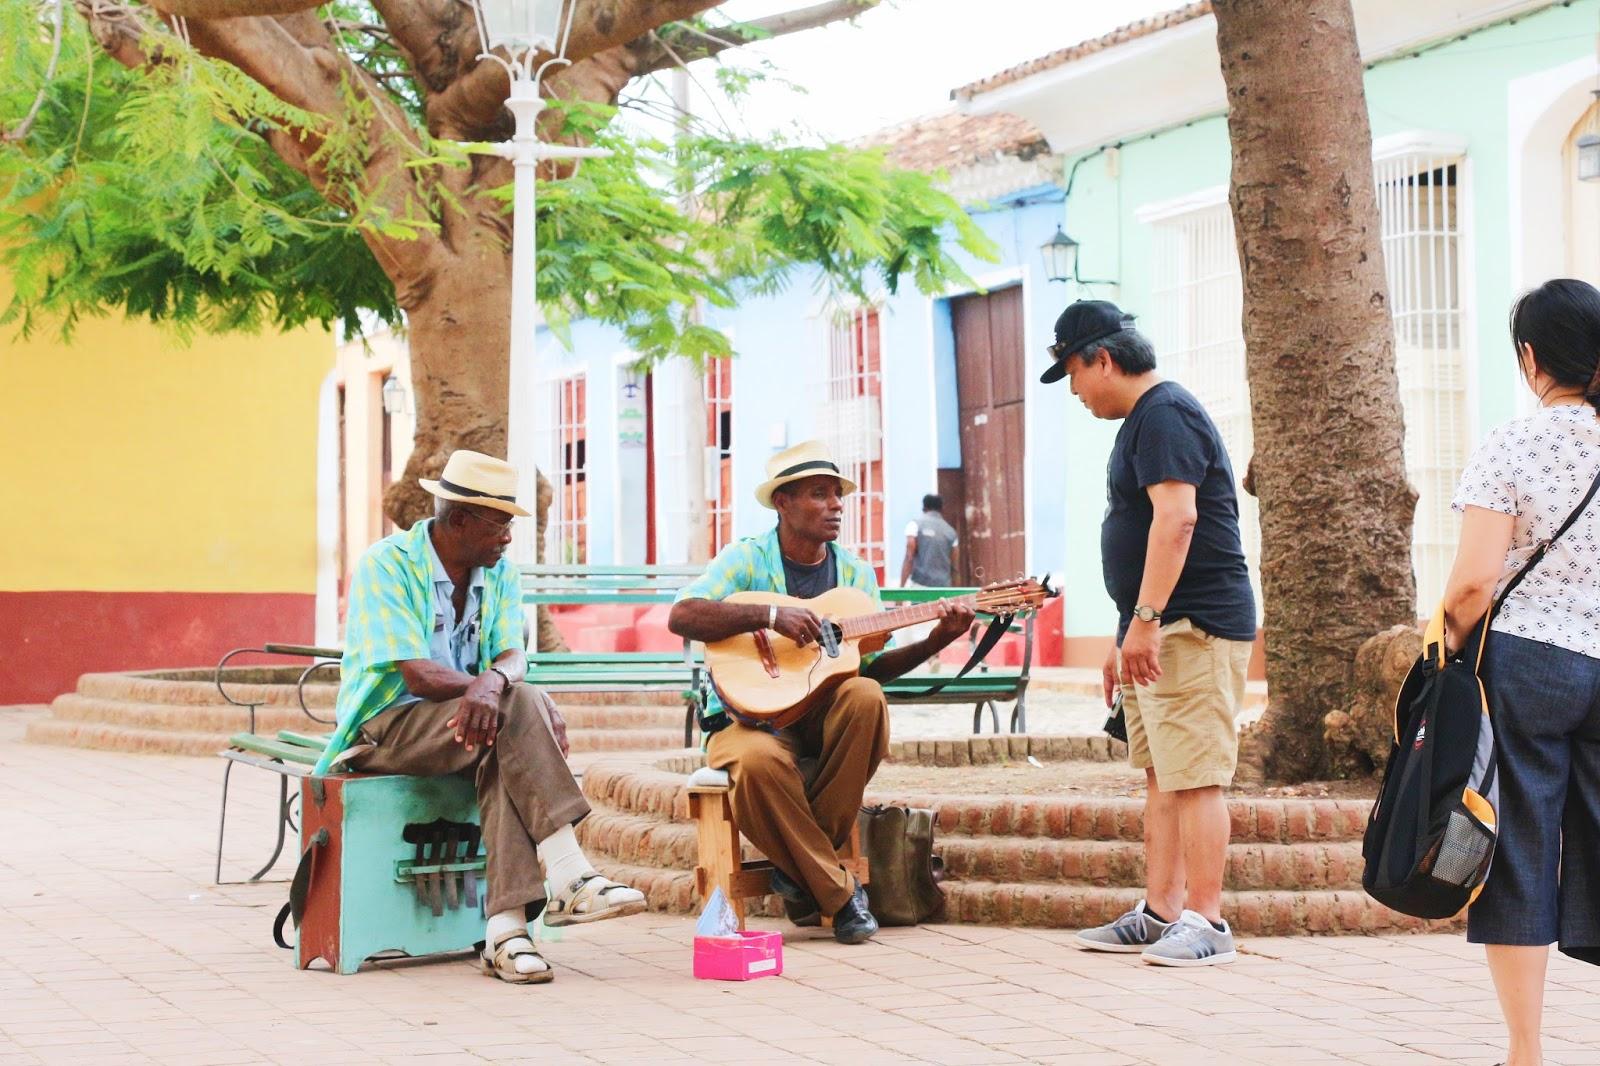 Musiciens Cubains à Trinidad